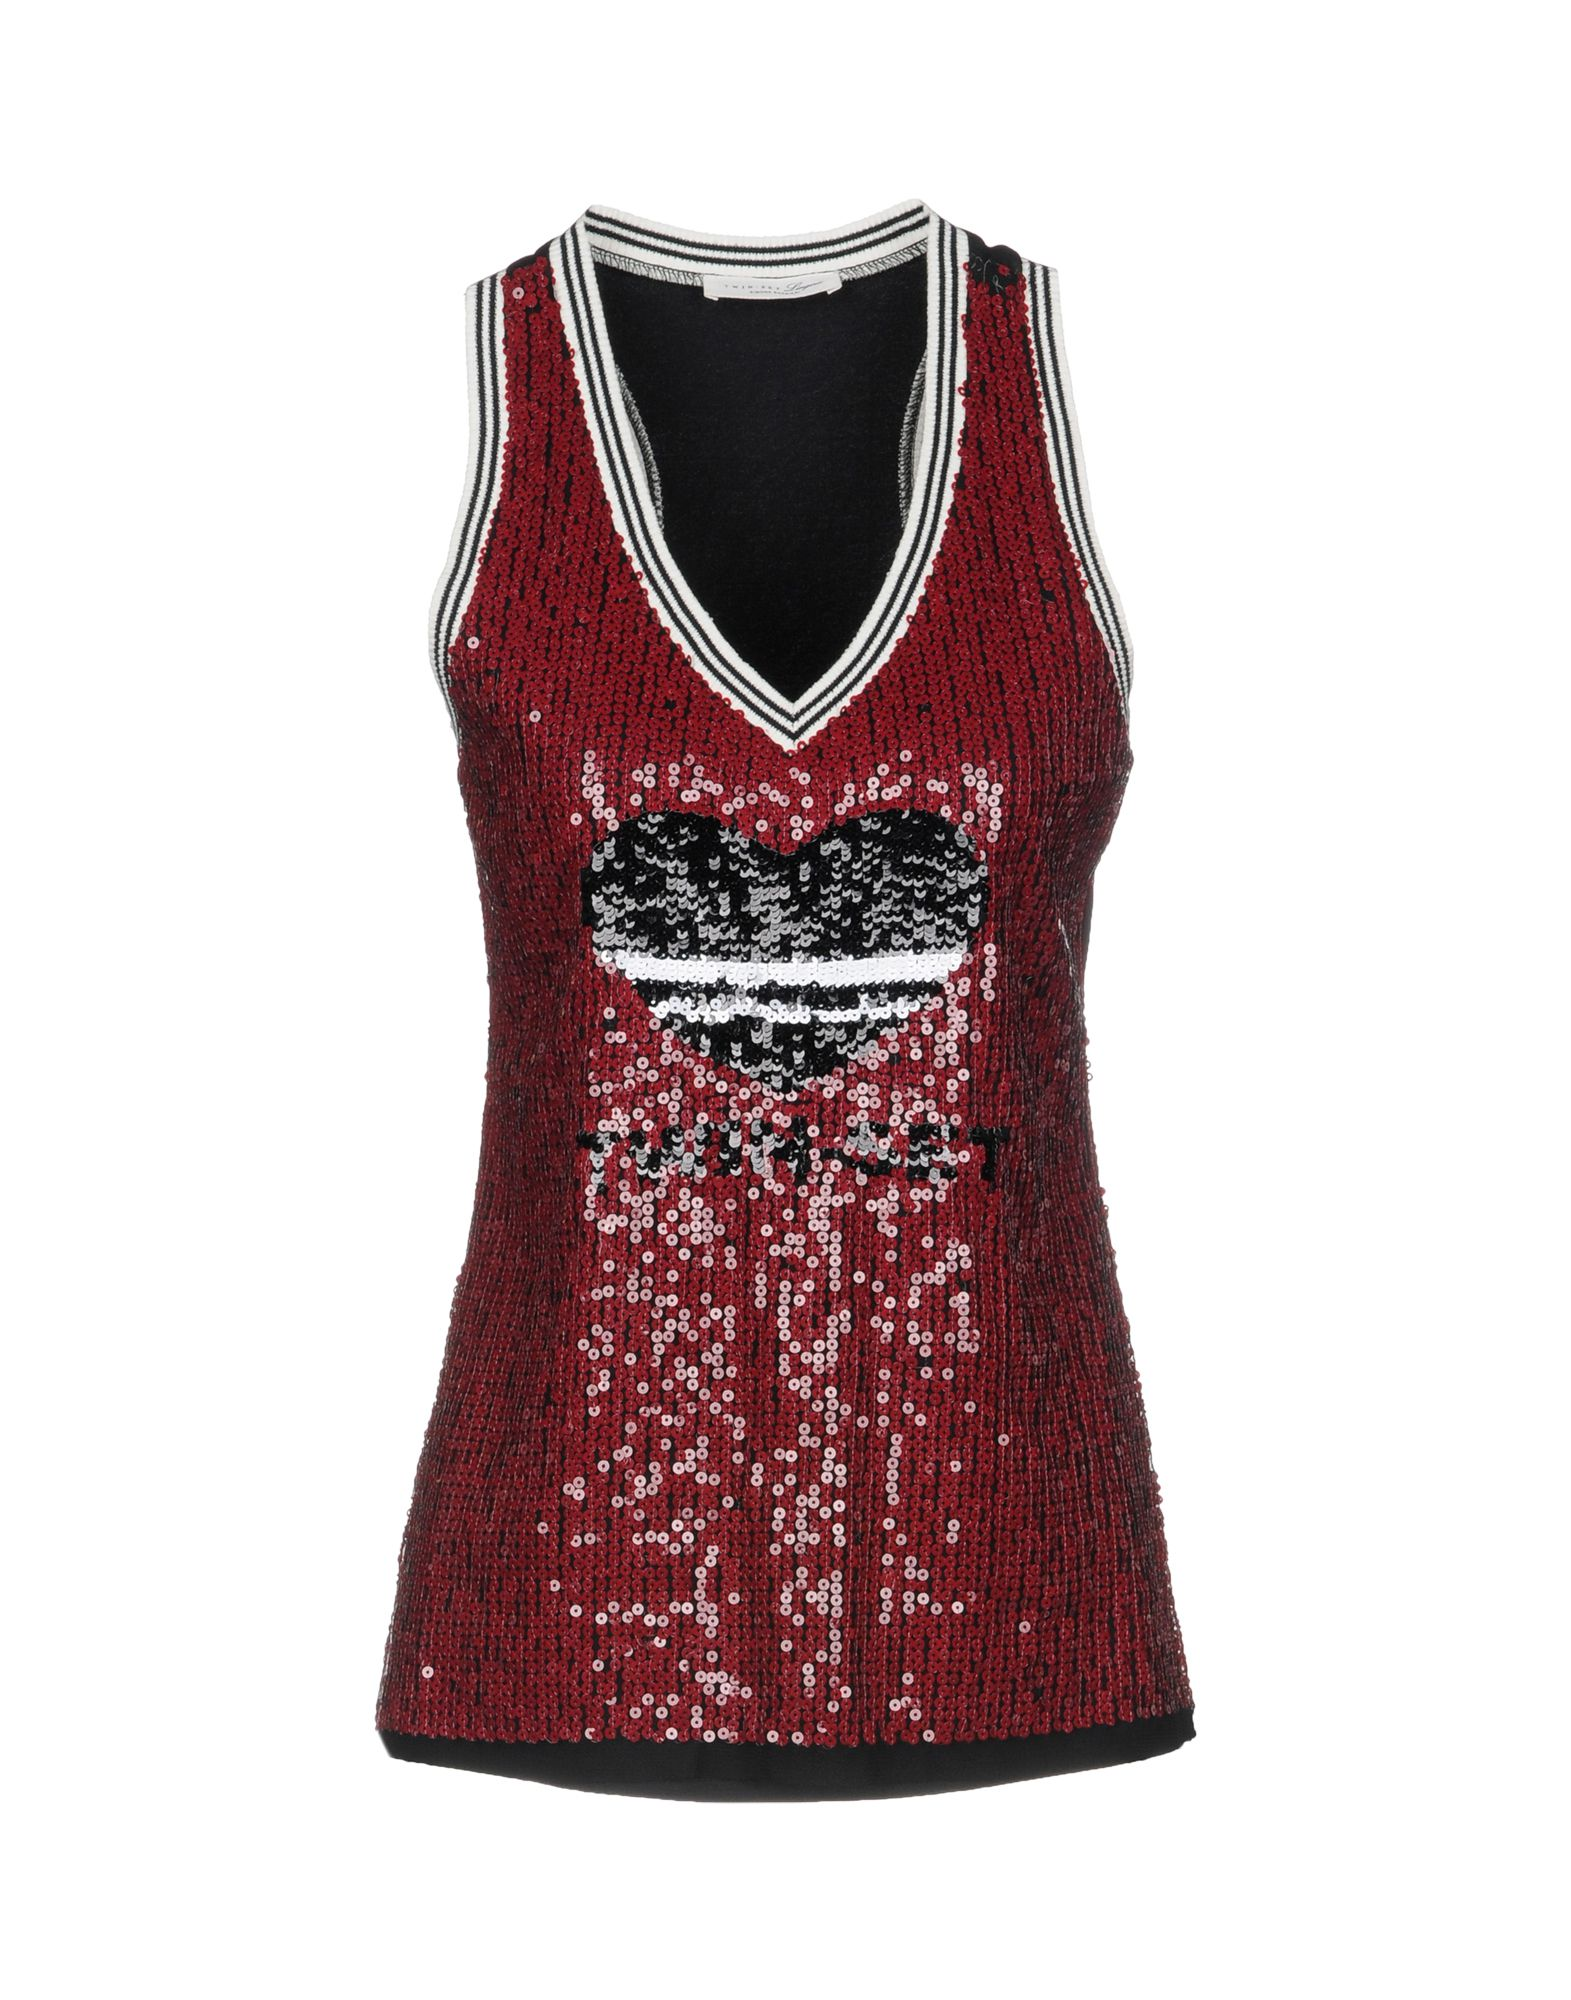 TWIN-SET LINGERIE Бельевая майка black lace details v neck with no falsies lingerie set